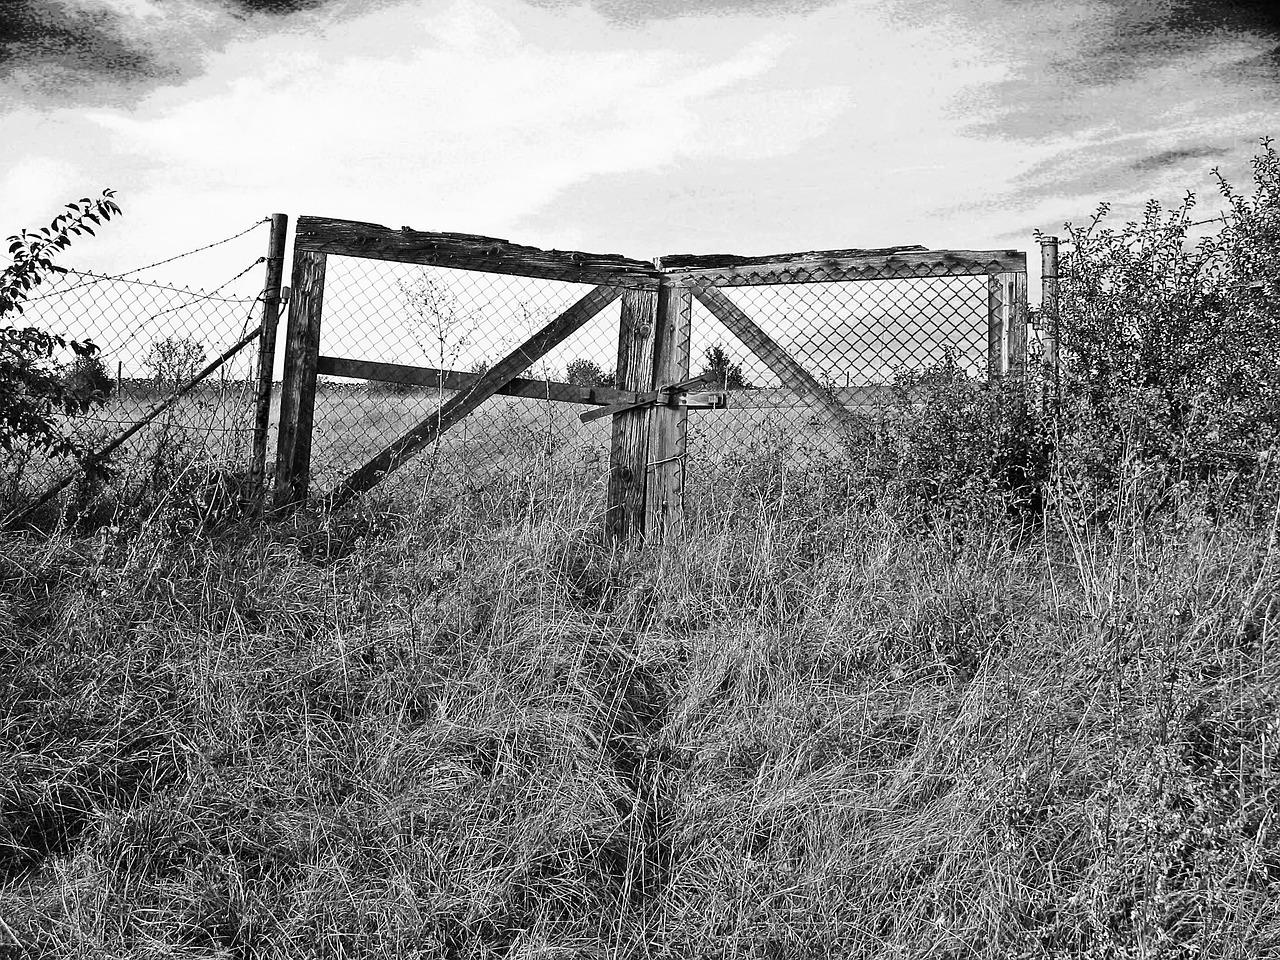 Goal,fence,input,metal,gate - free photo from needpix.com